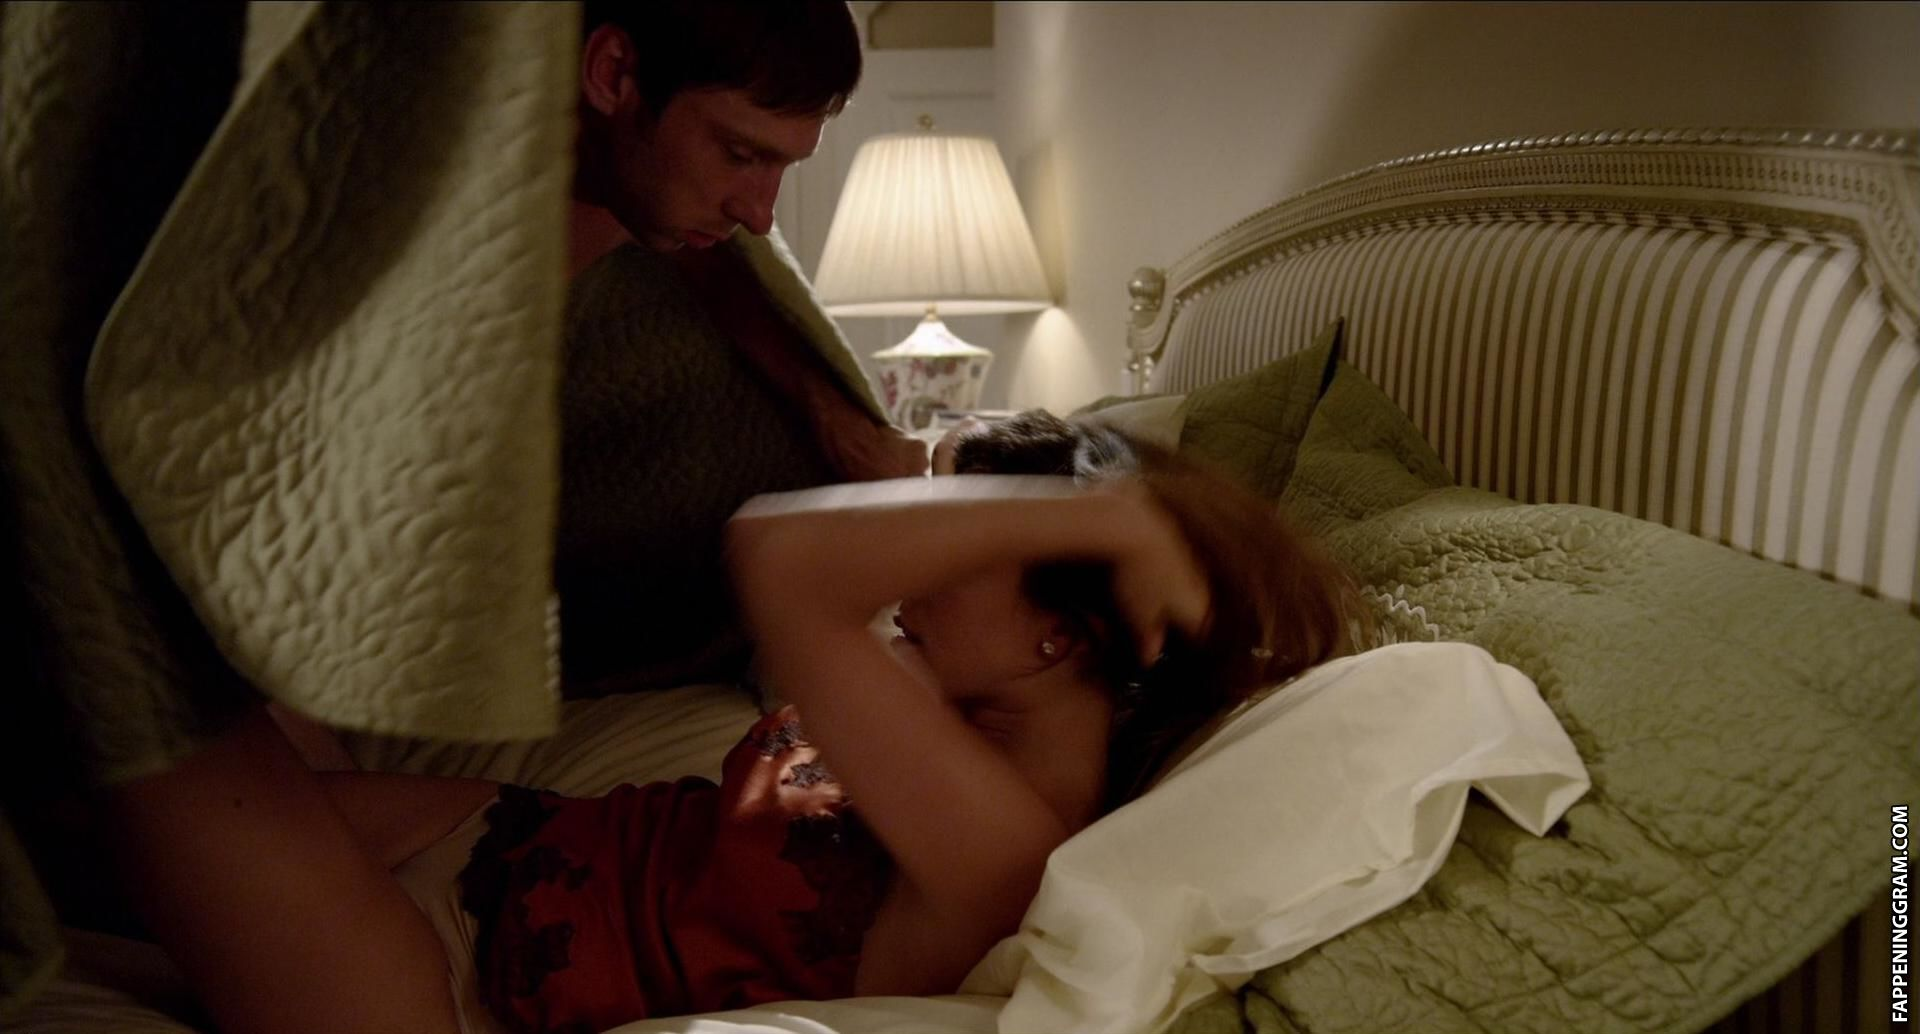 Jamie lynn sigler nude photos sex scene pics